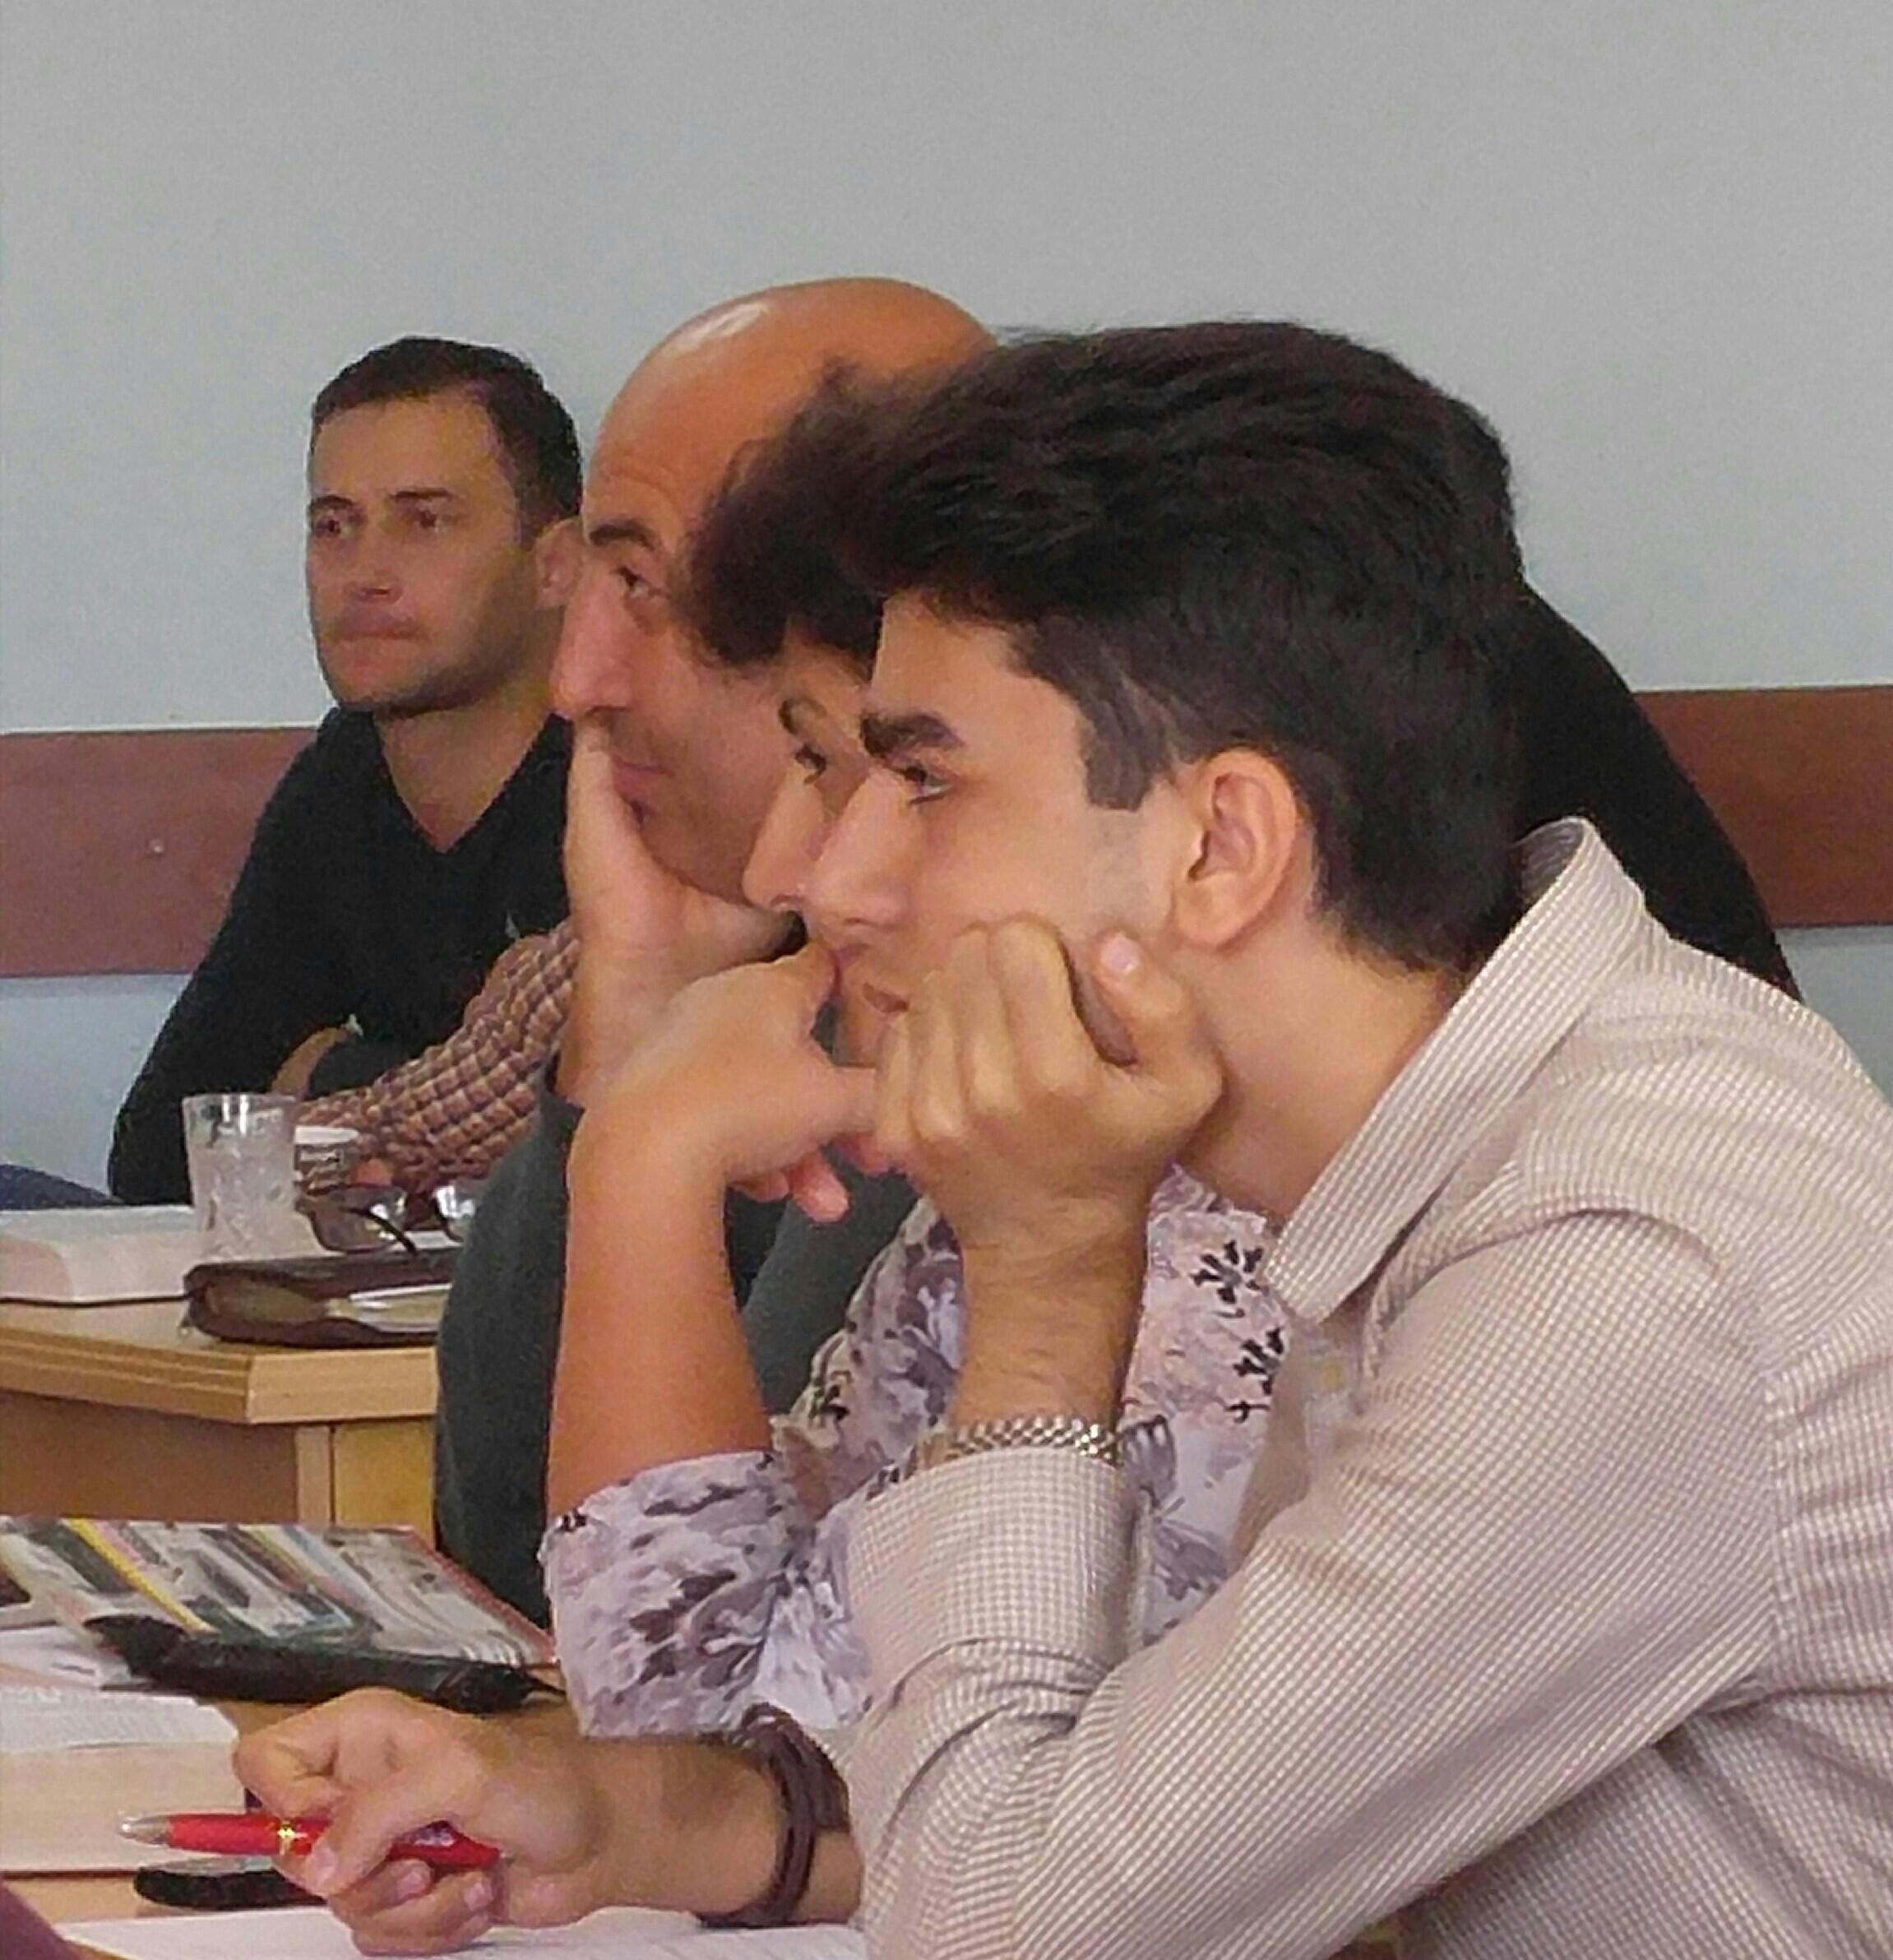 armentues11